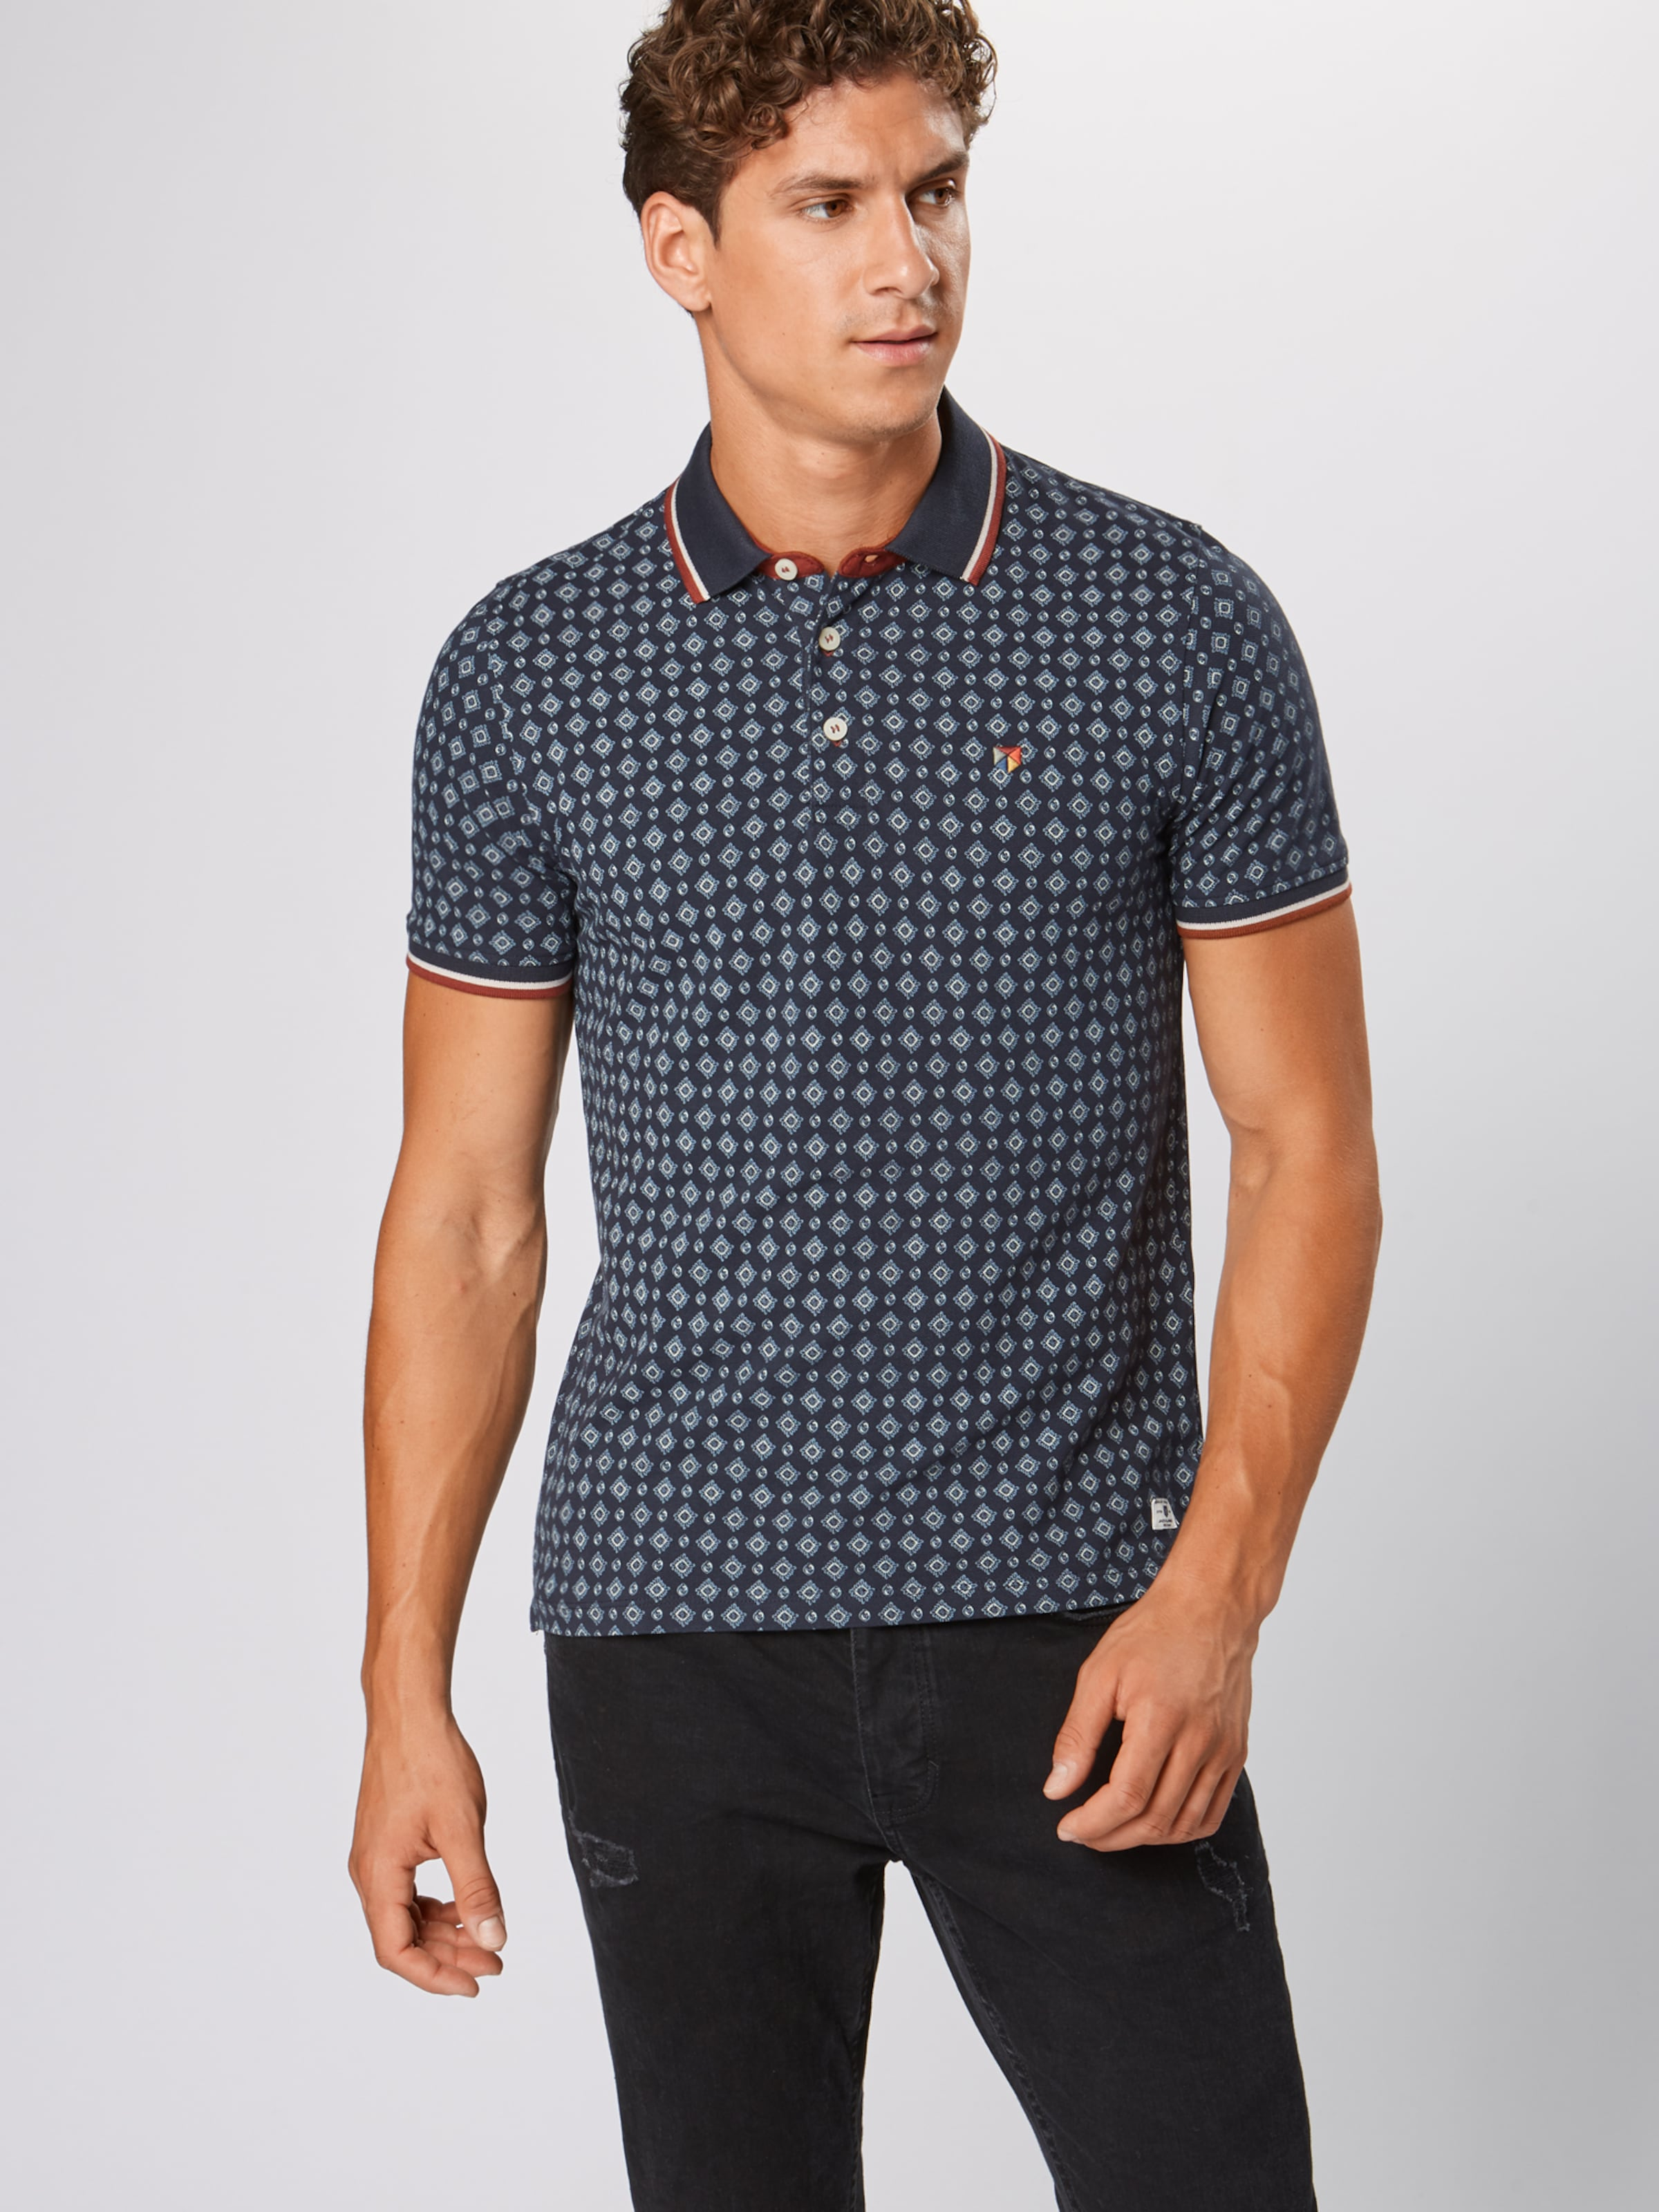 Jackamp; Bleu 'paulos' Jones Marine En T shirt 0Nmwvy8On